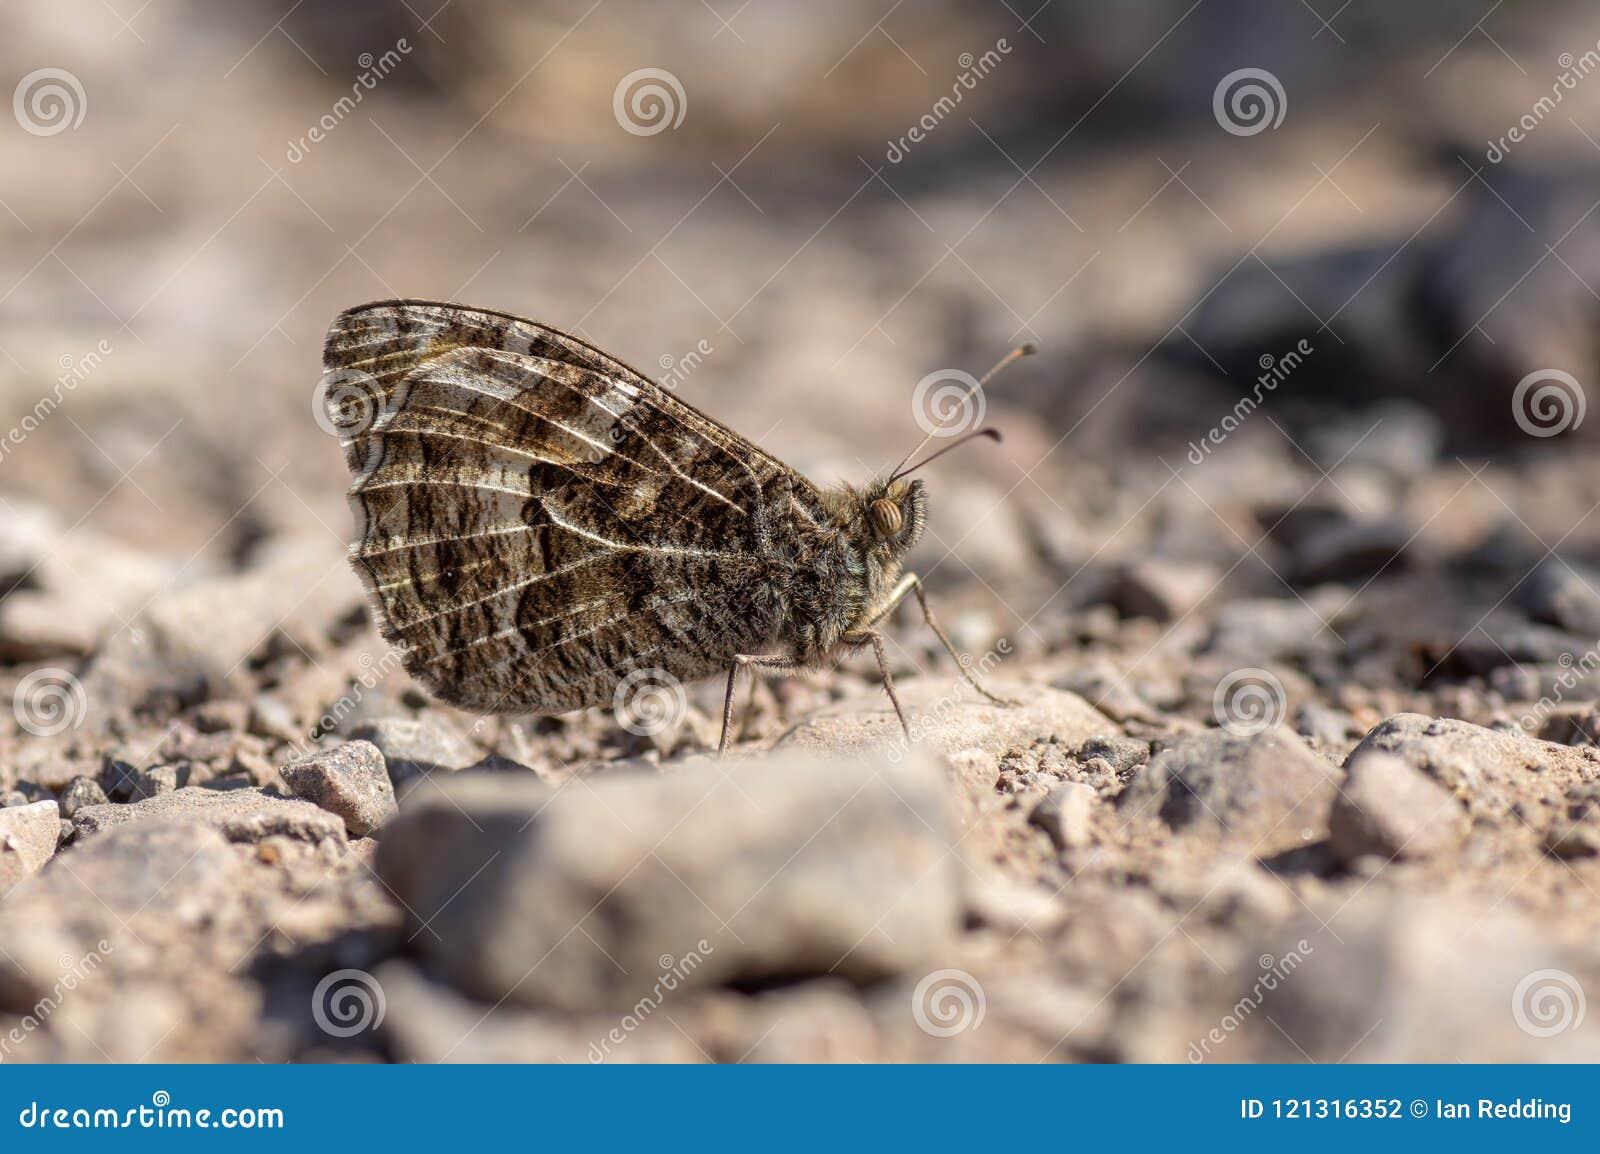 Graylingsvlinder Hipparchia semele op rotsachtige grond